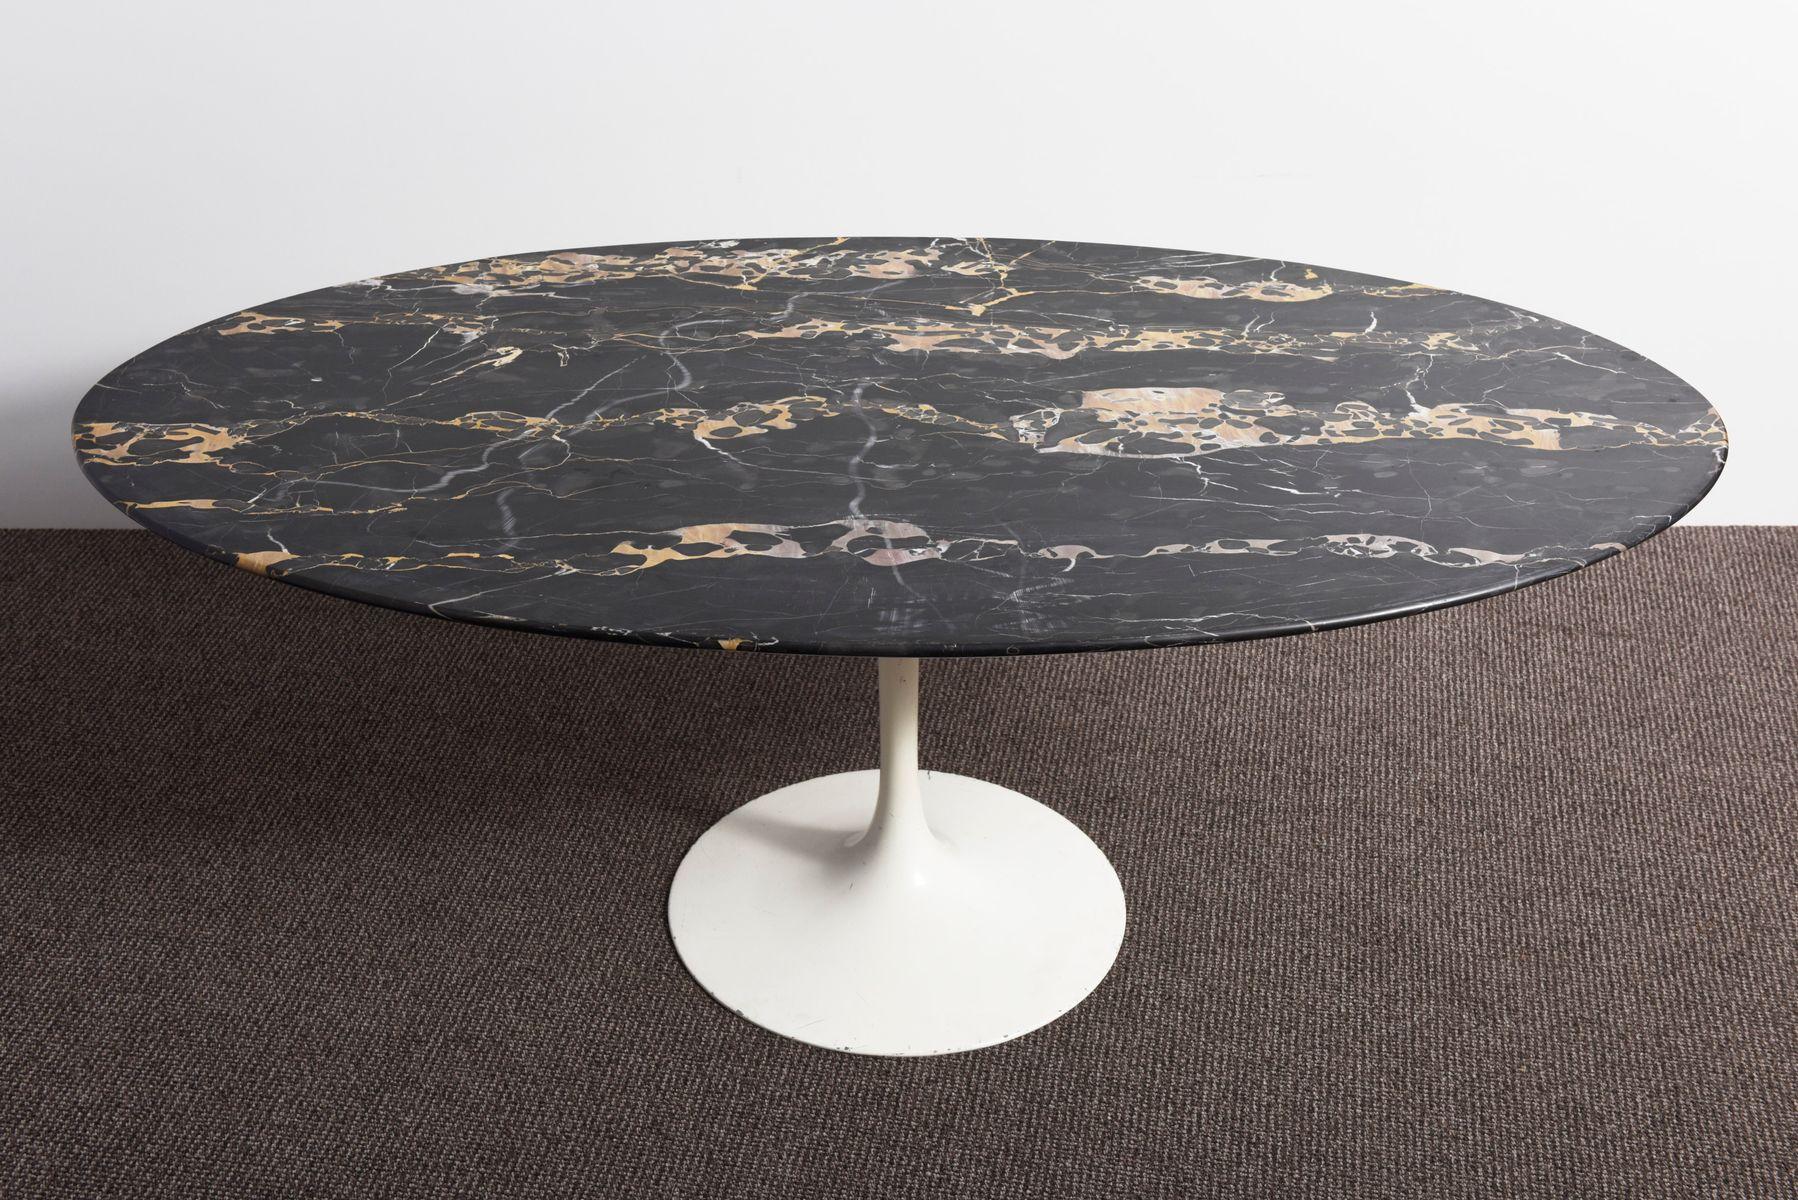 Tulip Black Marble Coffee Table By Eero Saarinen For Knoll